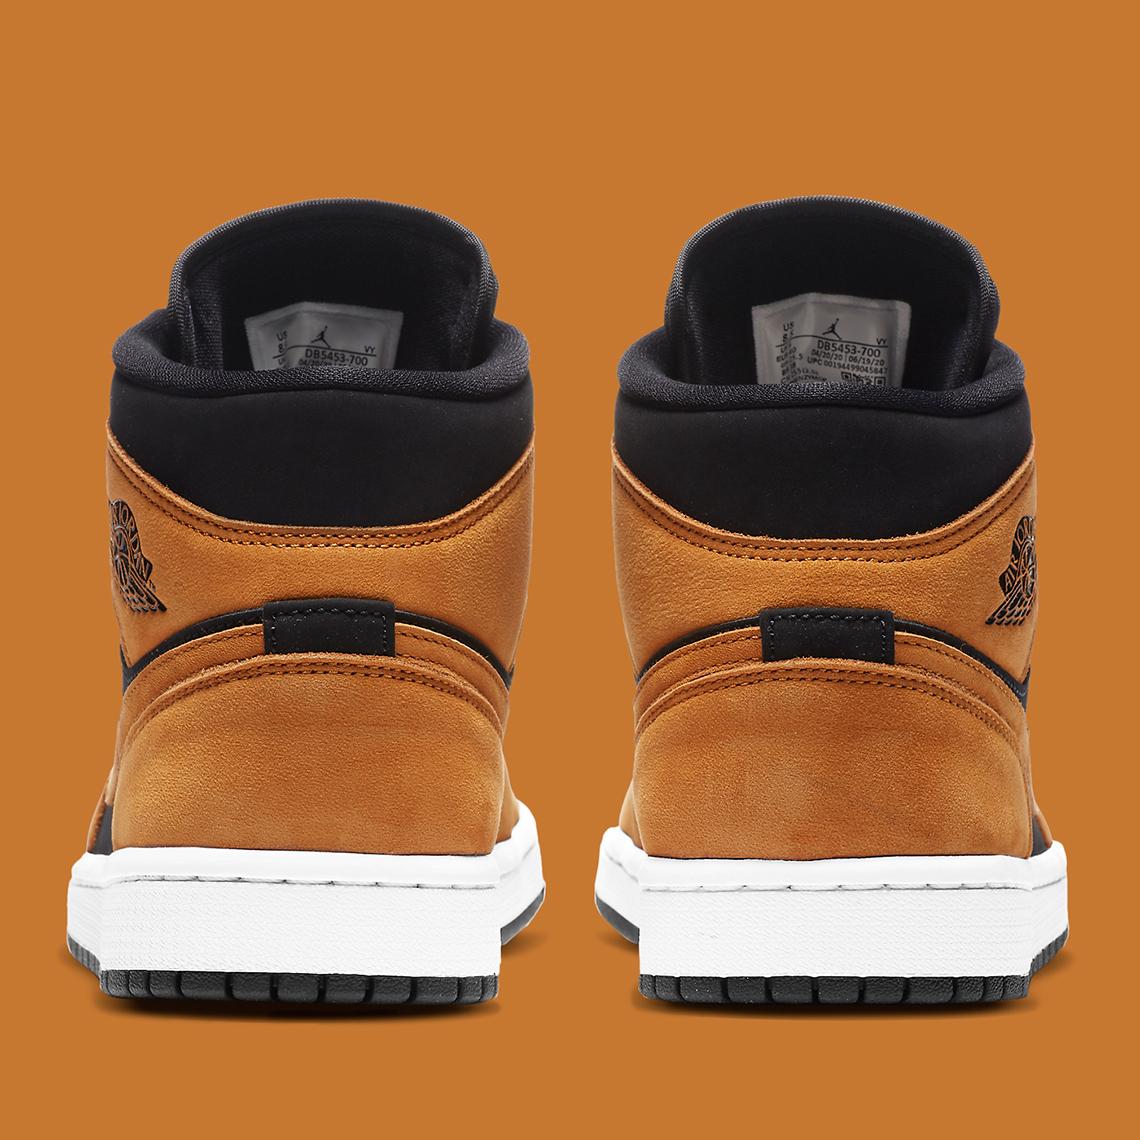 Air Jordan 1 Mid ''Wheat'' - DB5453-700